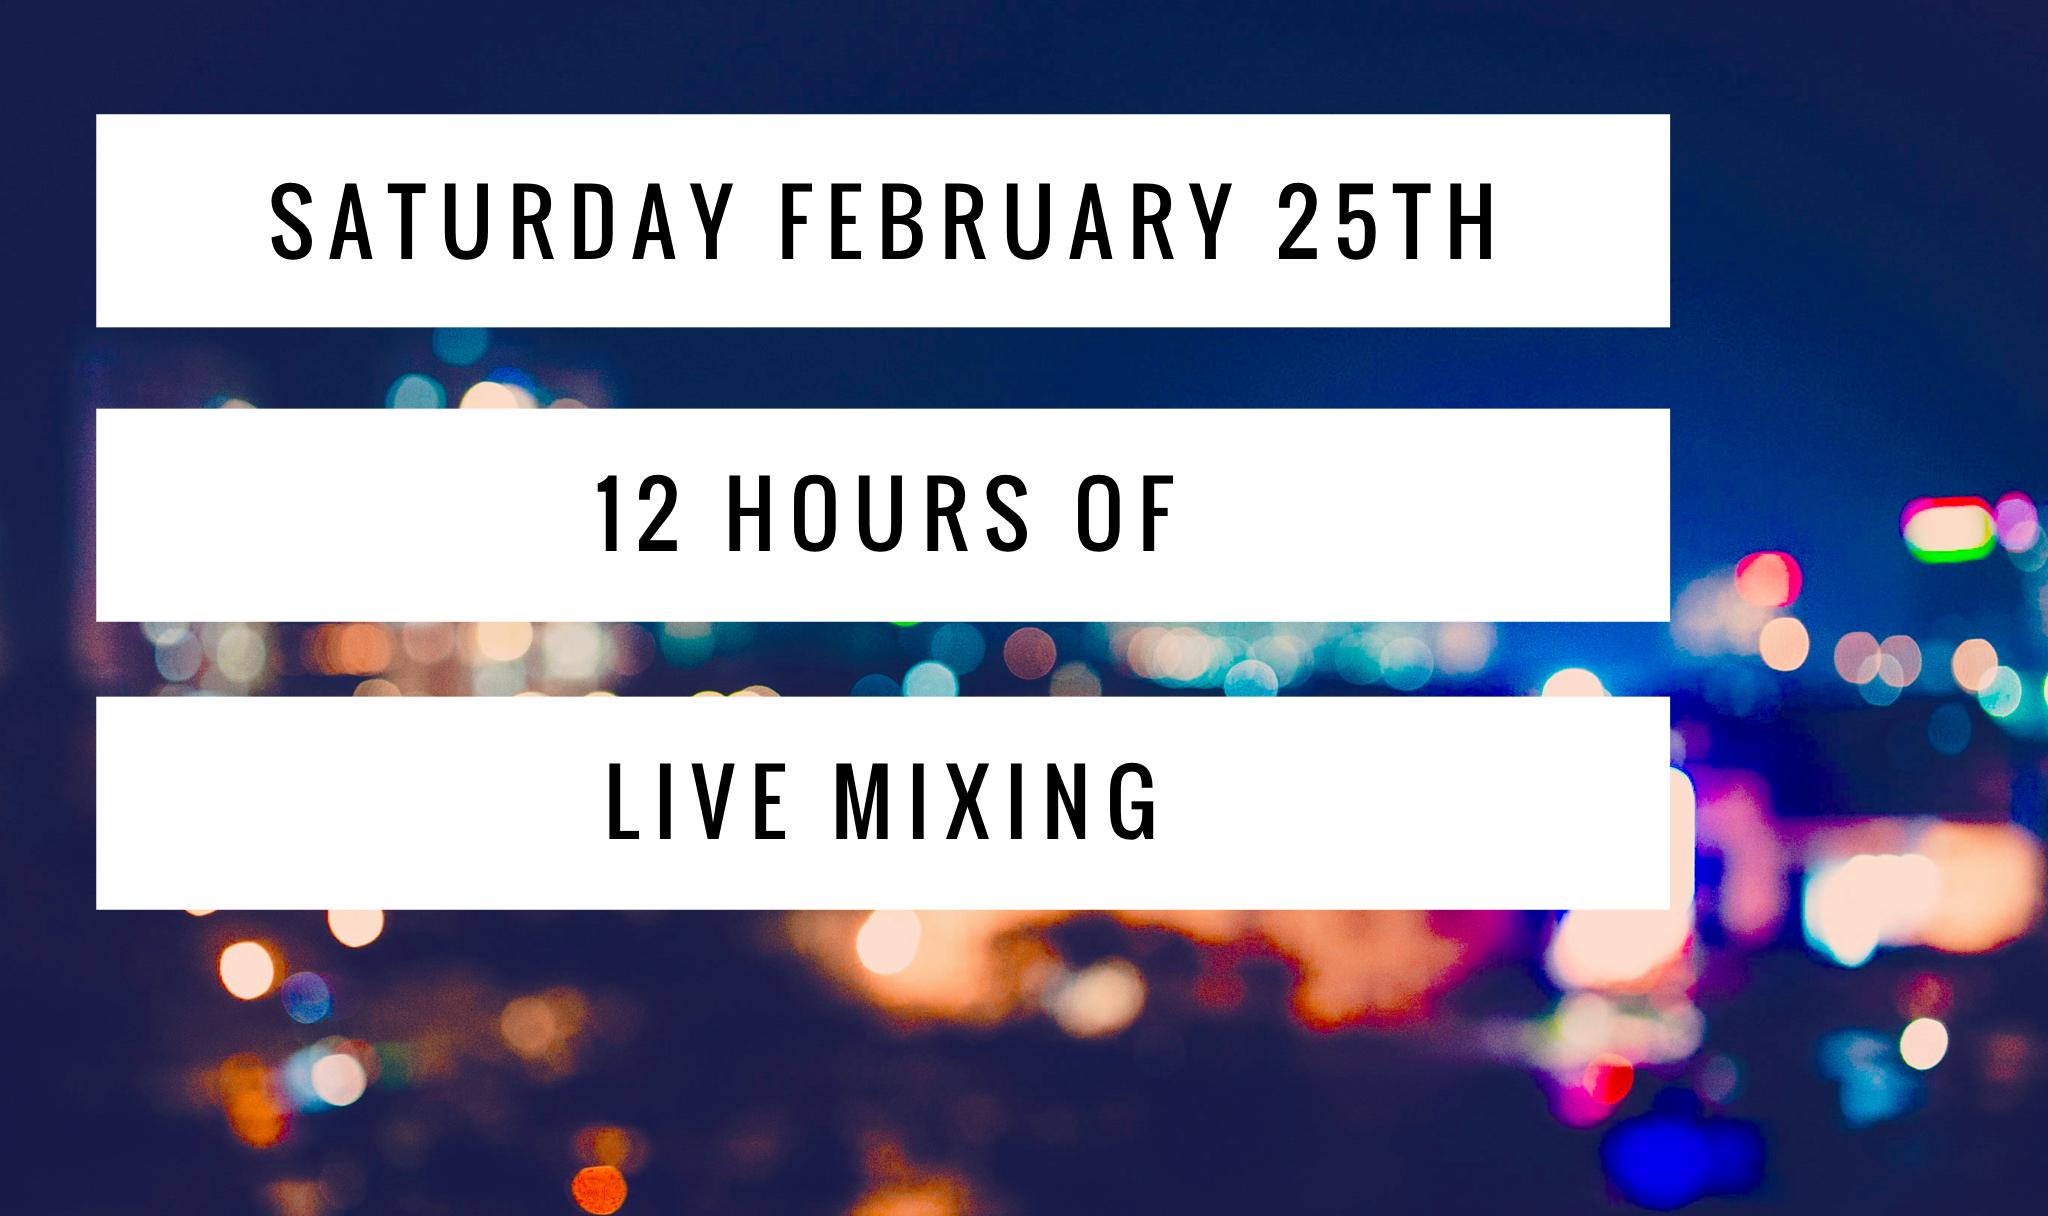 Latino live mix weekend!